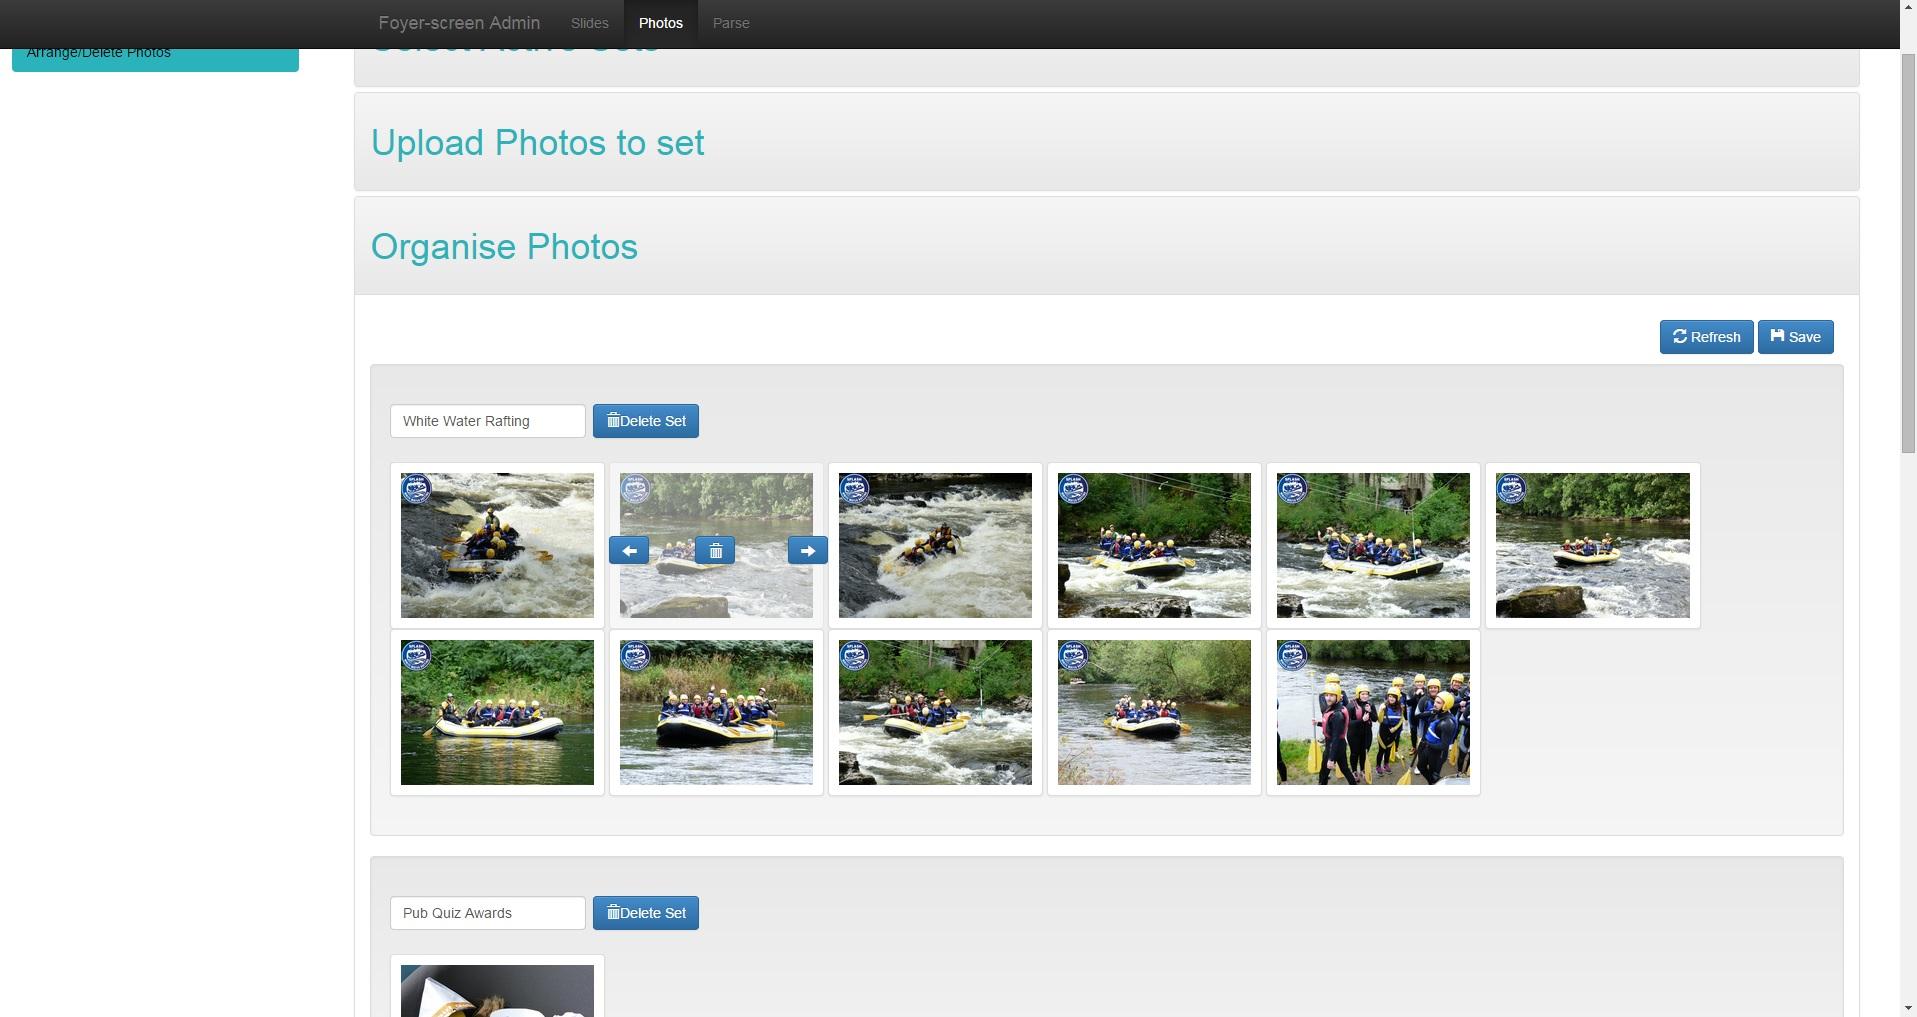 Admin Organise Photos